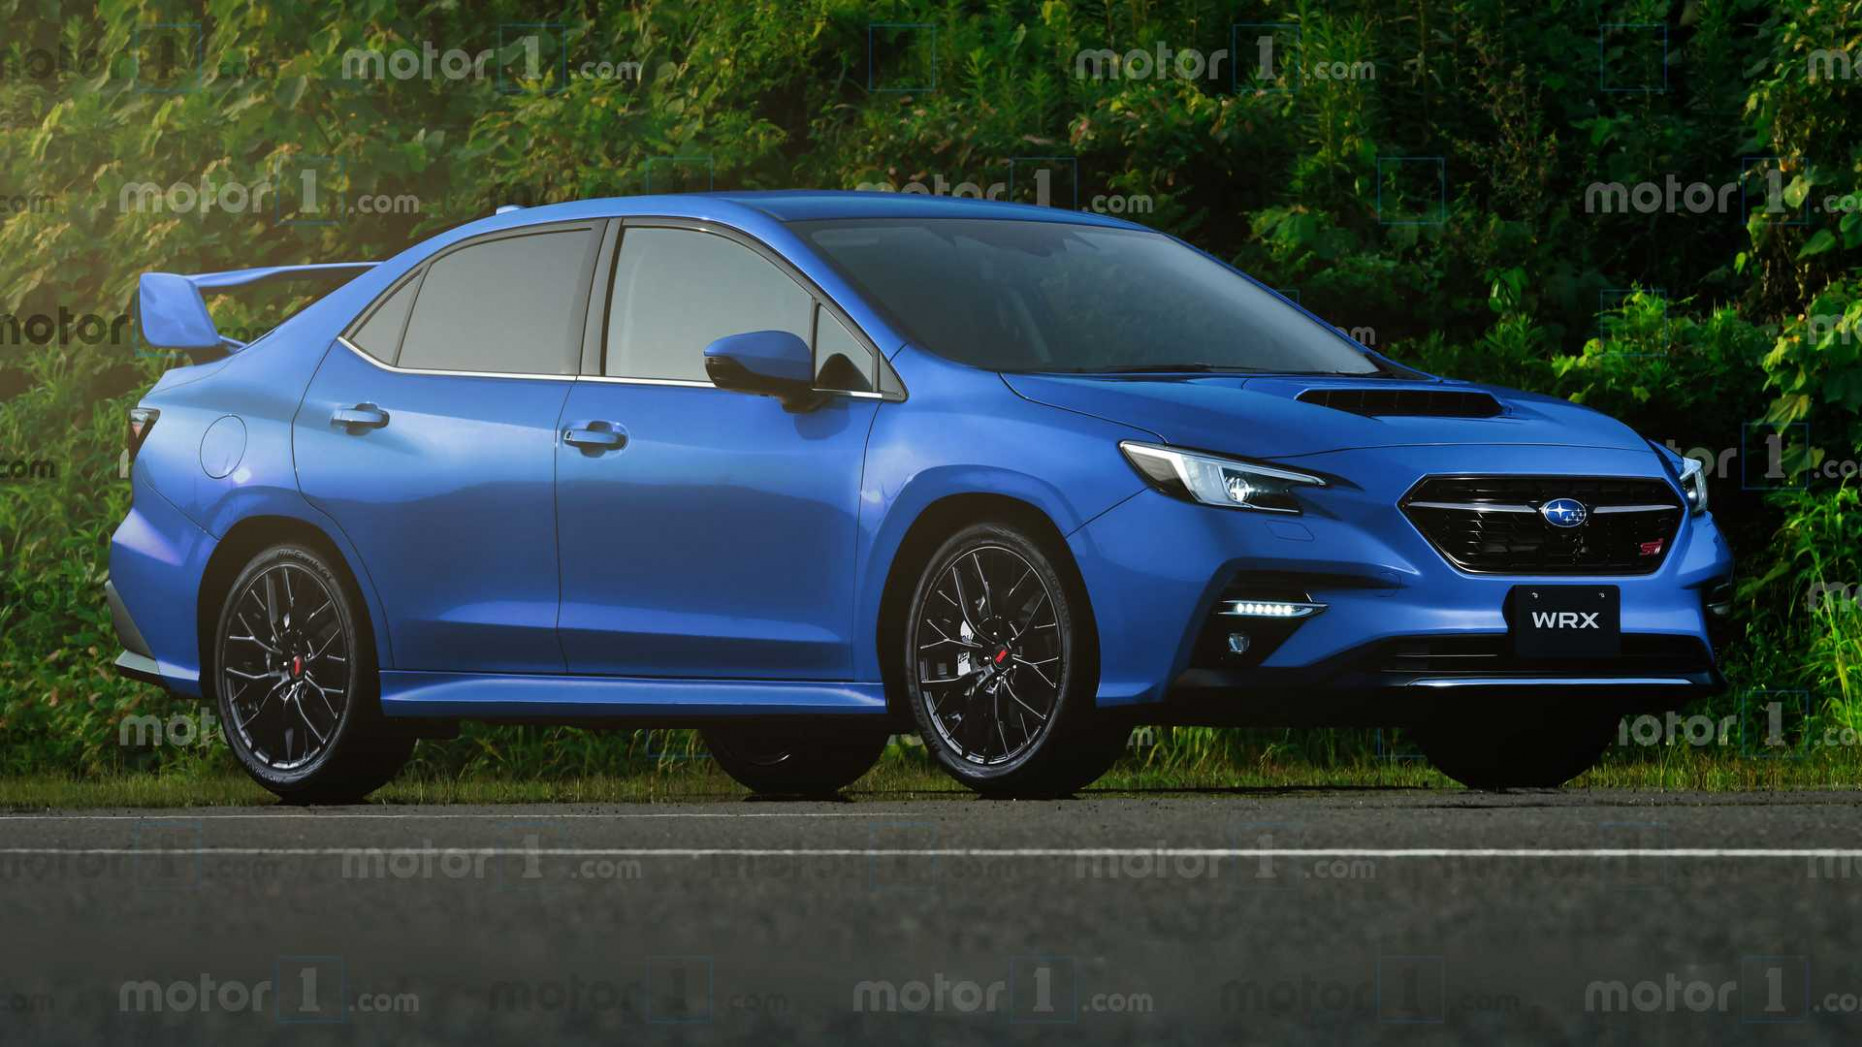 Overview Subaru Wrx 2022 Redesign